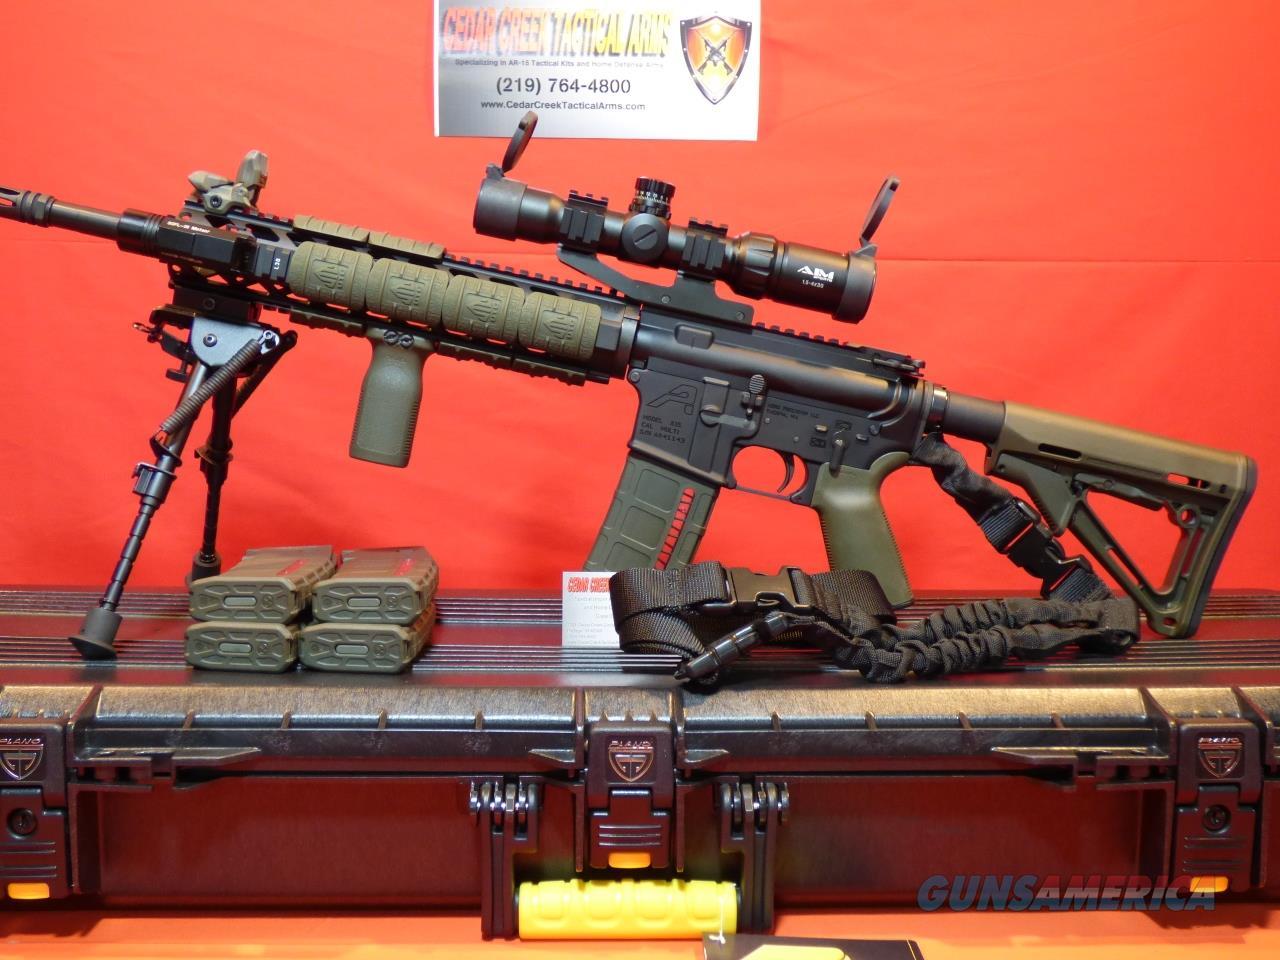 Aero Precision AC-15 Deluxe Tactical Kit  Guns > Rifles > Aero Precision > Aero Precision Rifles